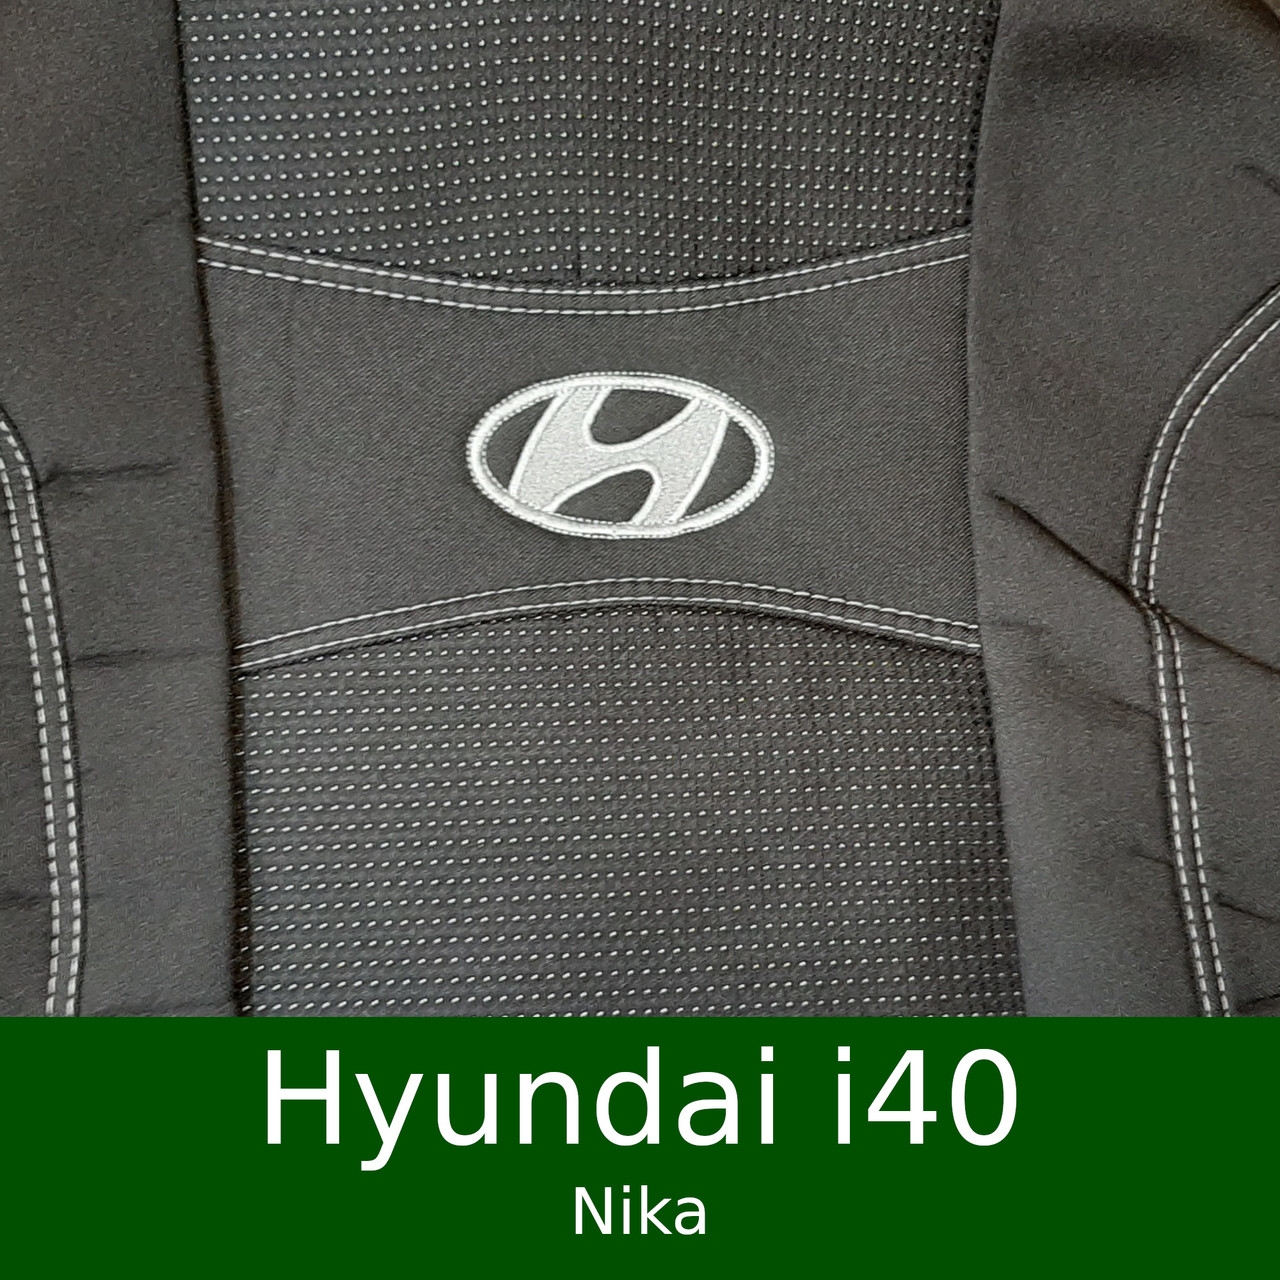 Чехлы на сиденья Hyundai i40 2011- (Nika)